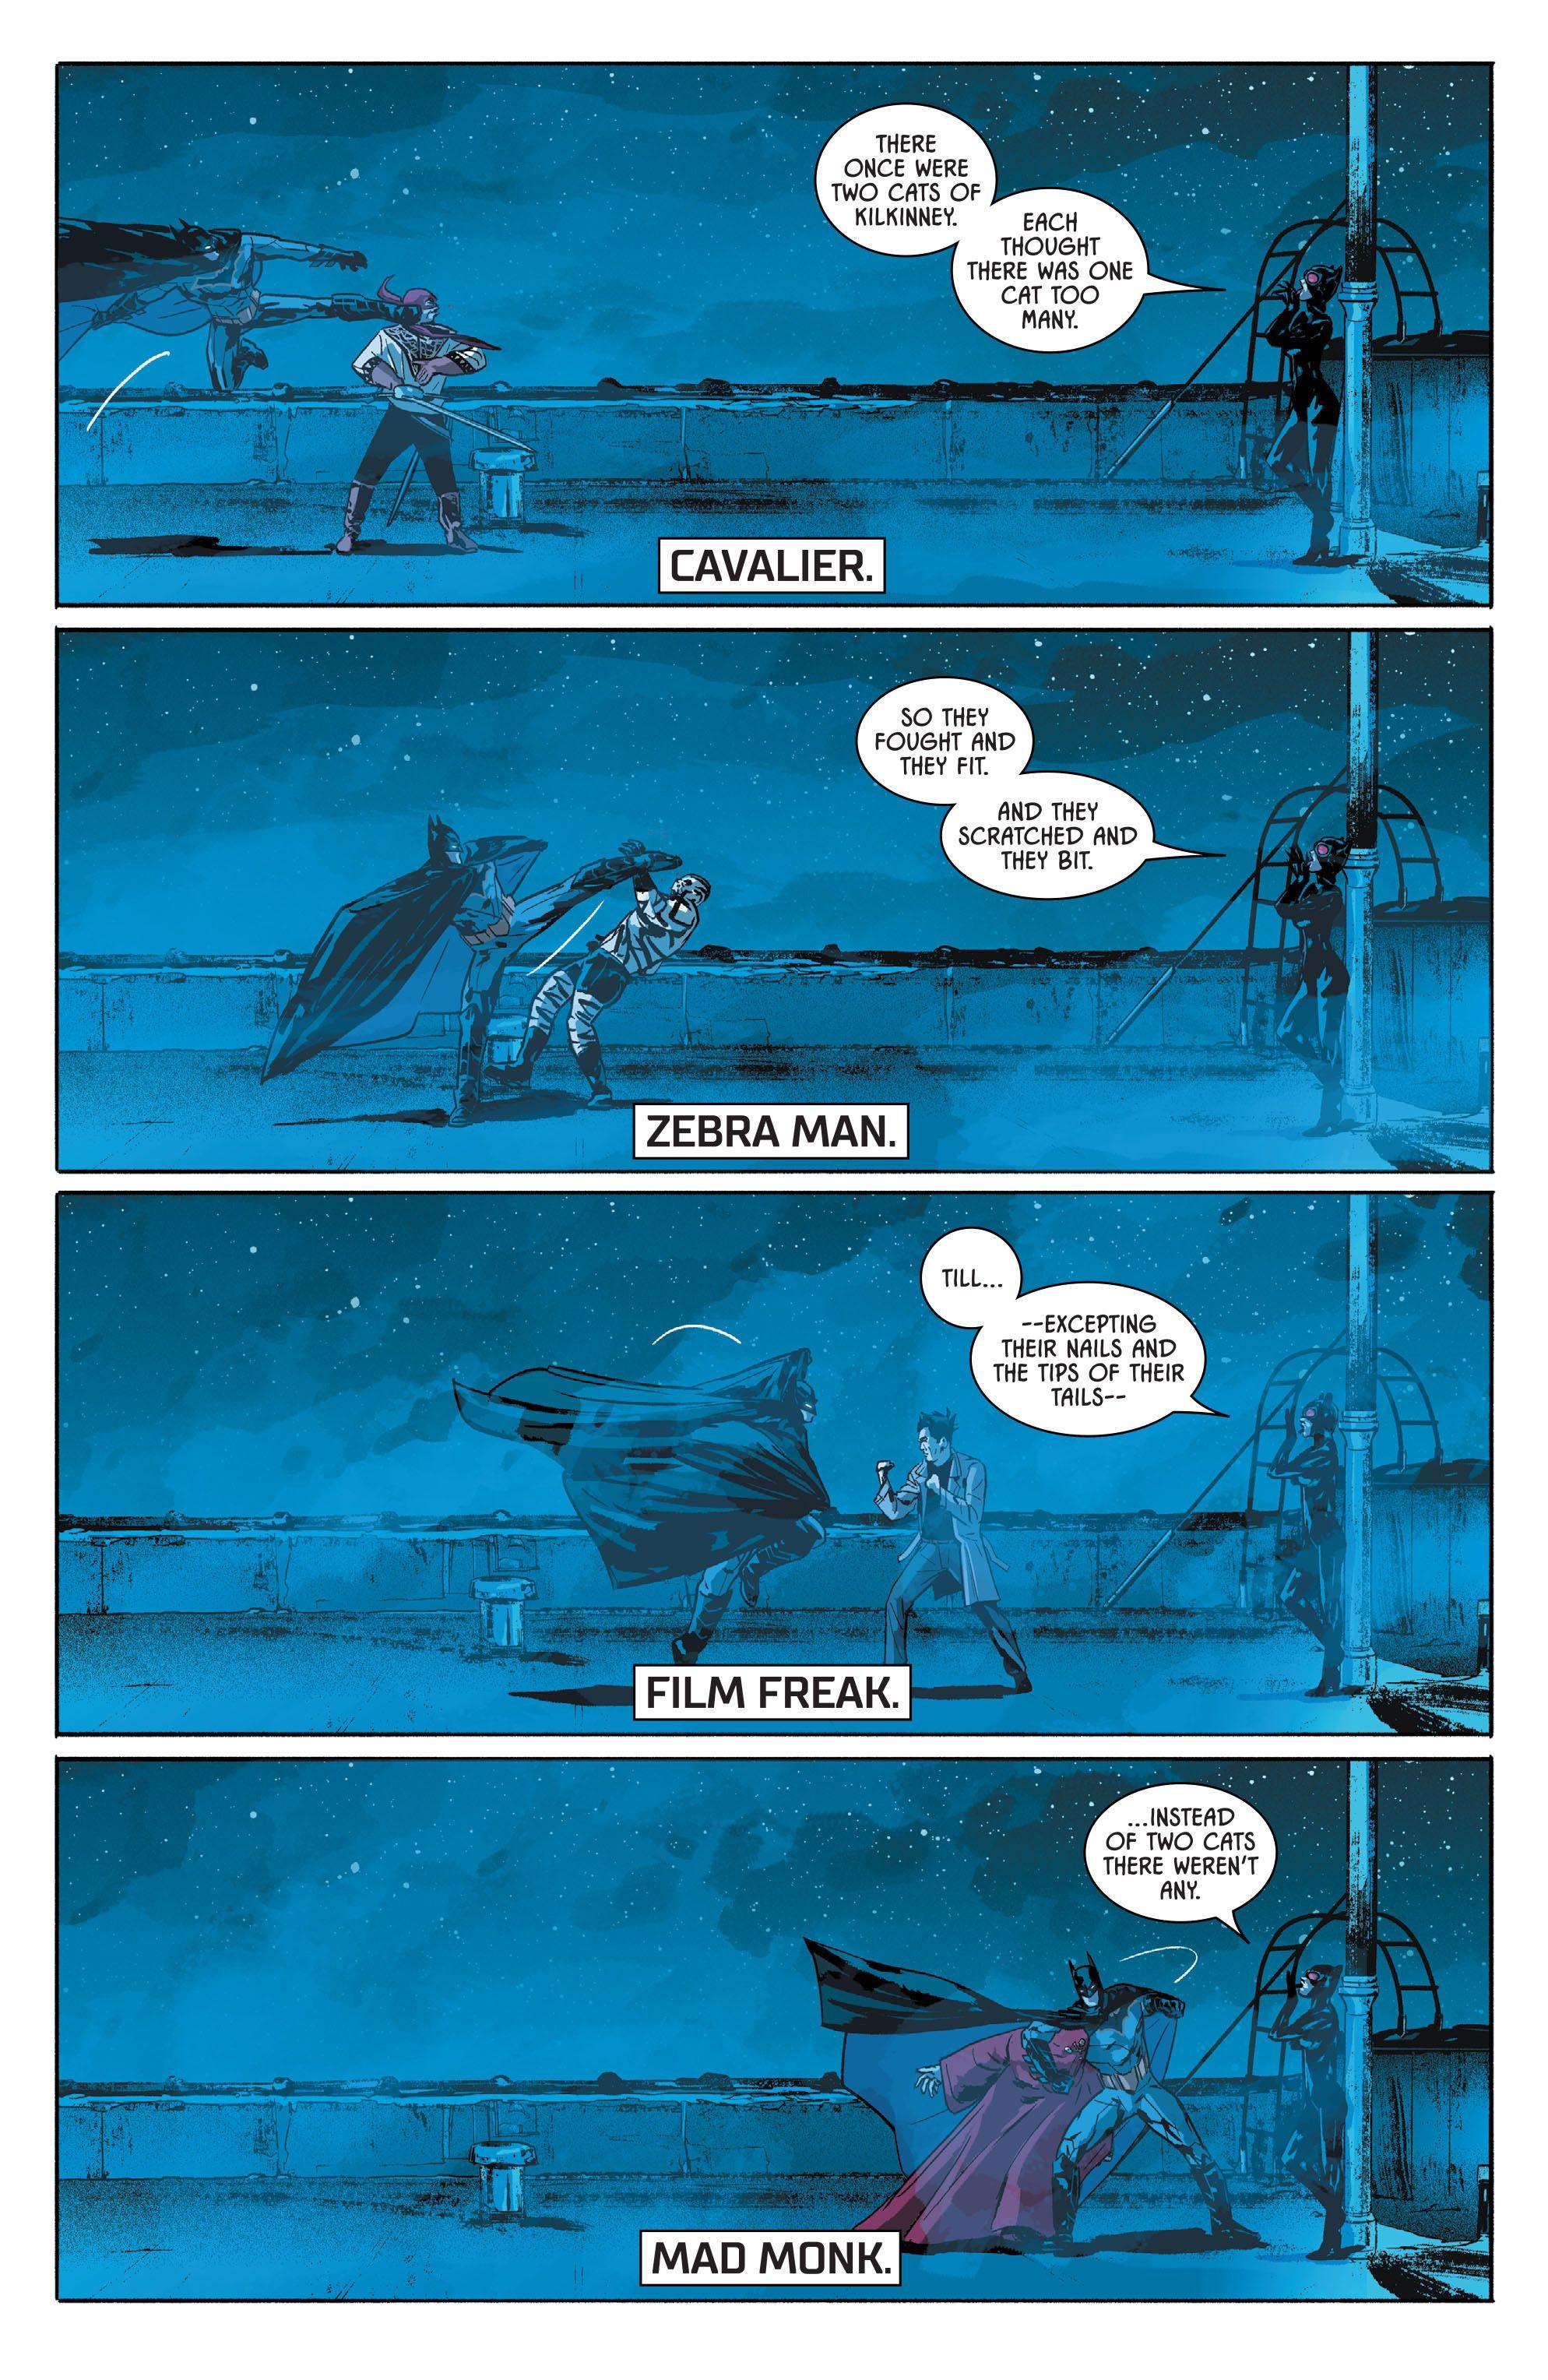 Read Batman 2016 Issue 091 online | Comicpunch.net